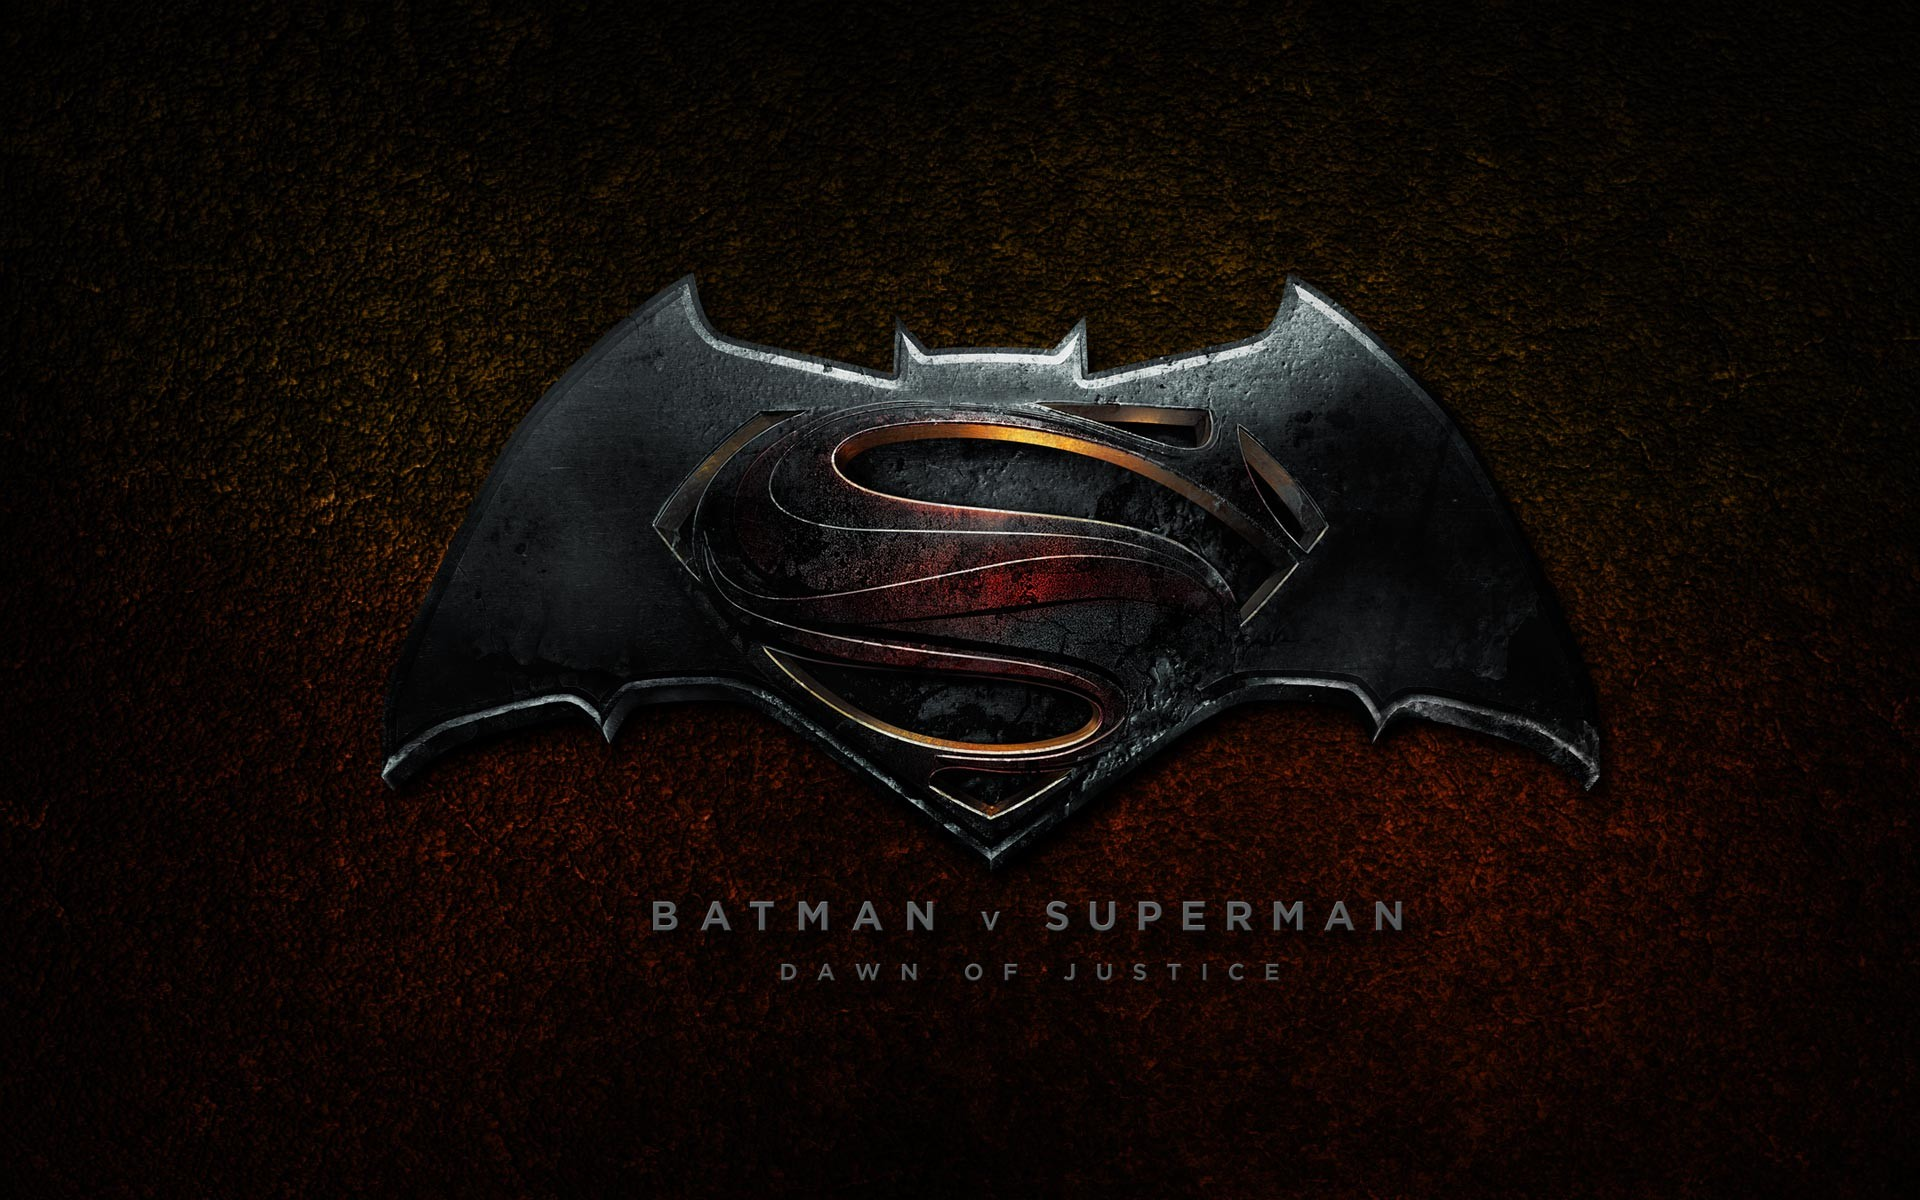 Batman Vs Superman Full Movie Online